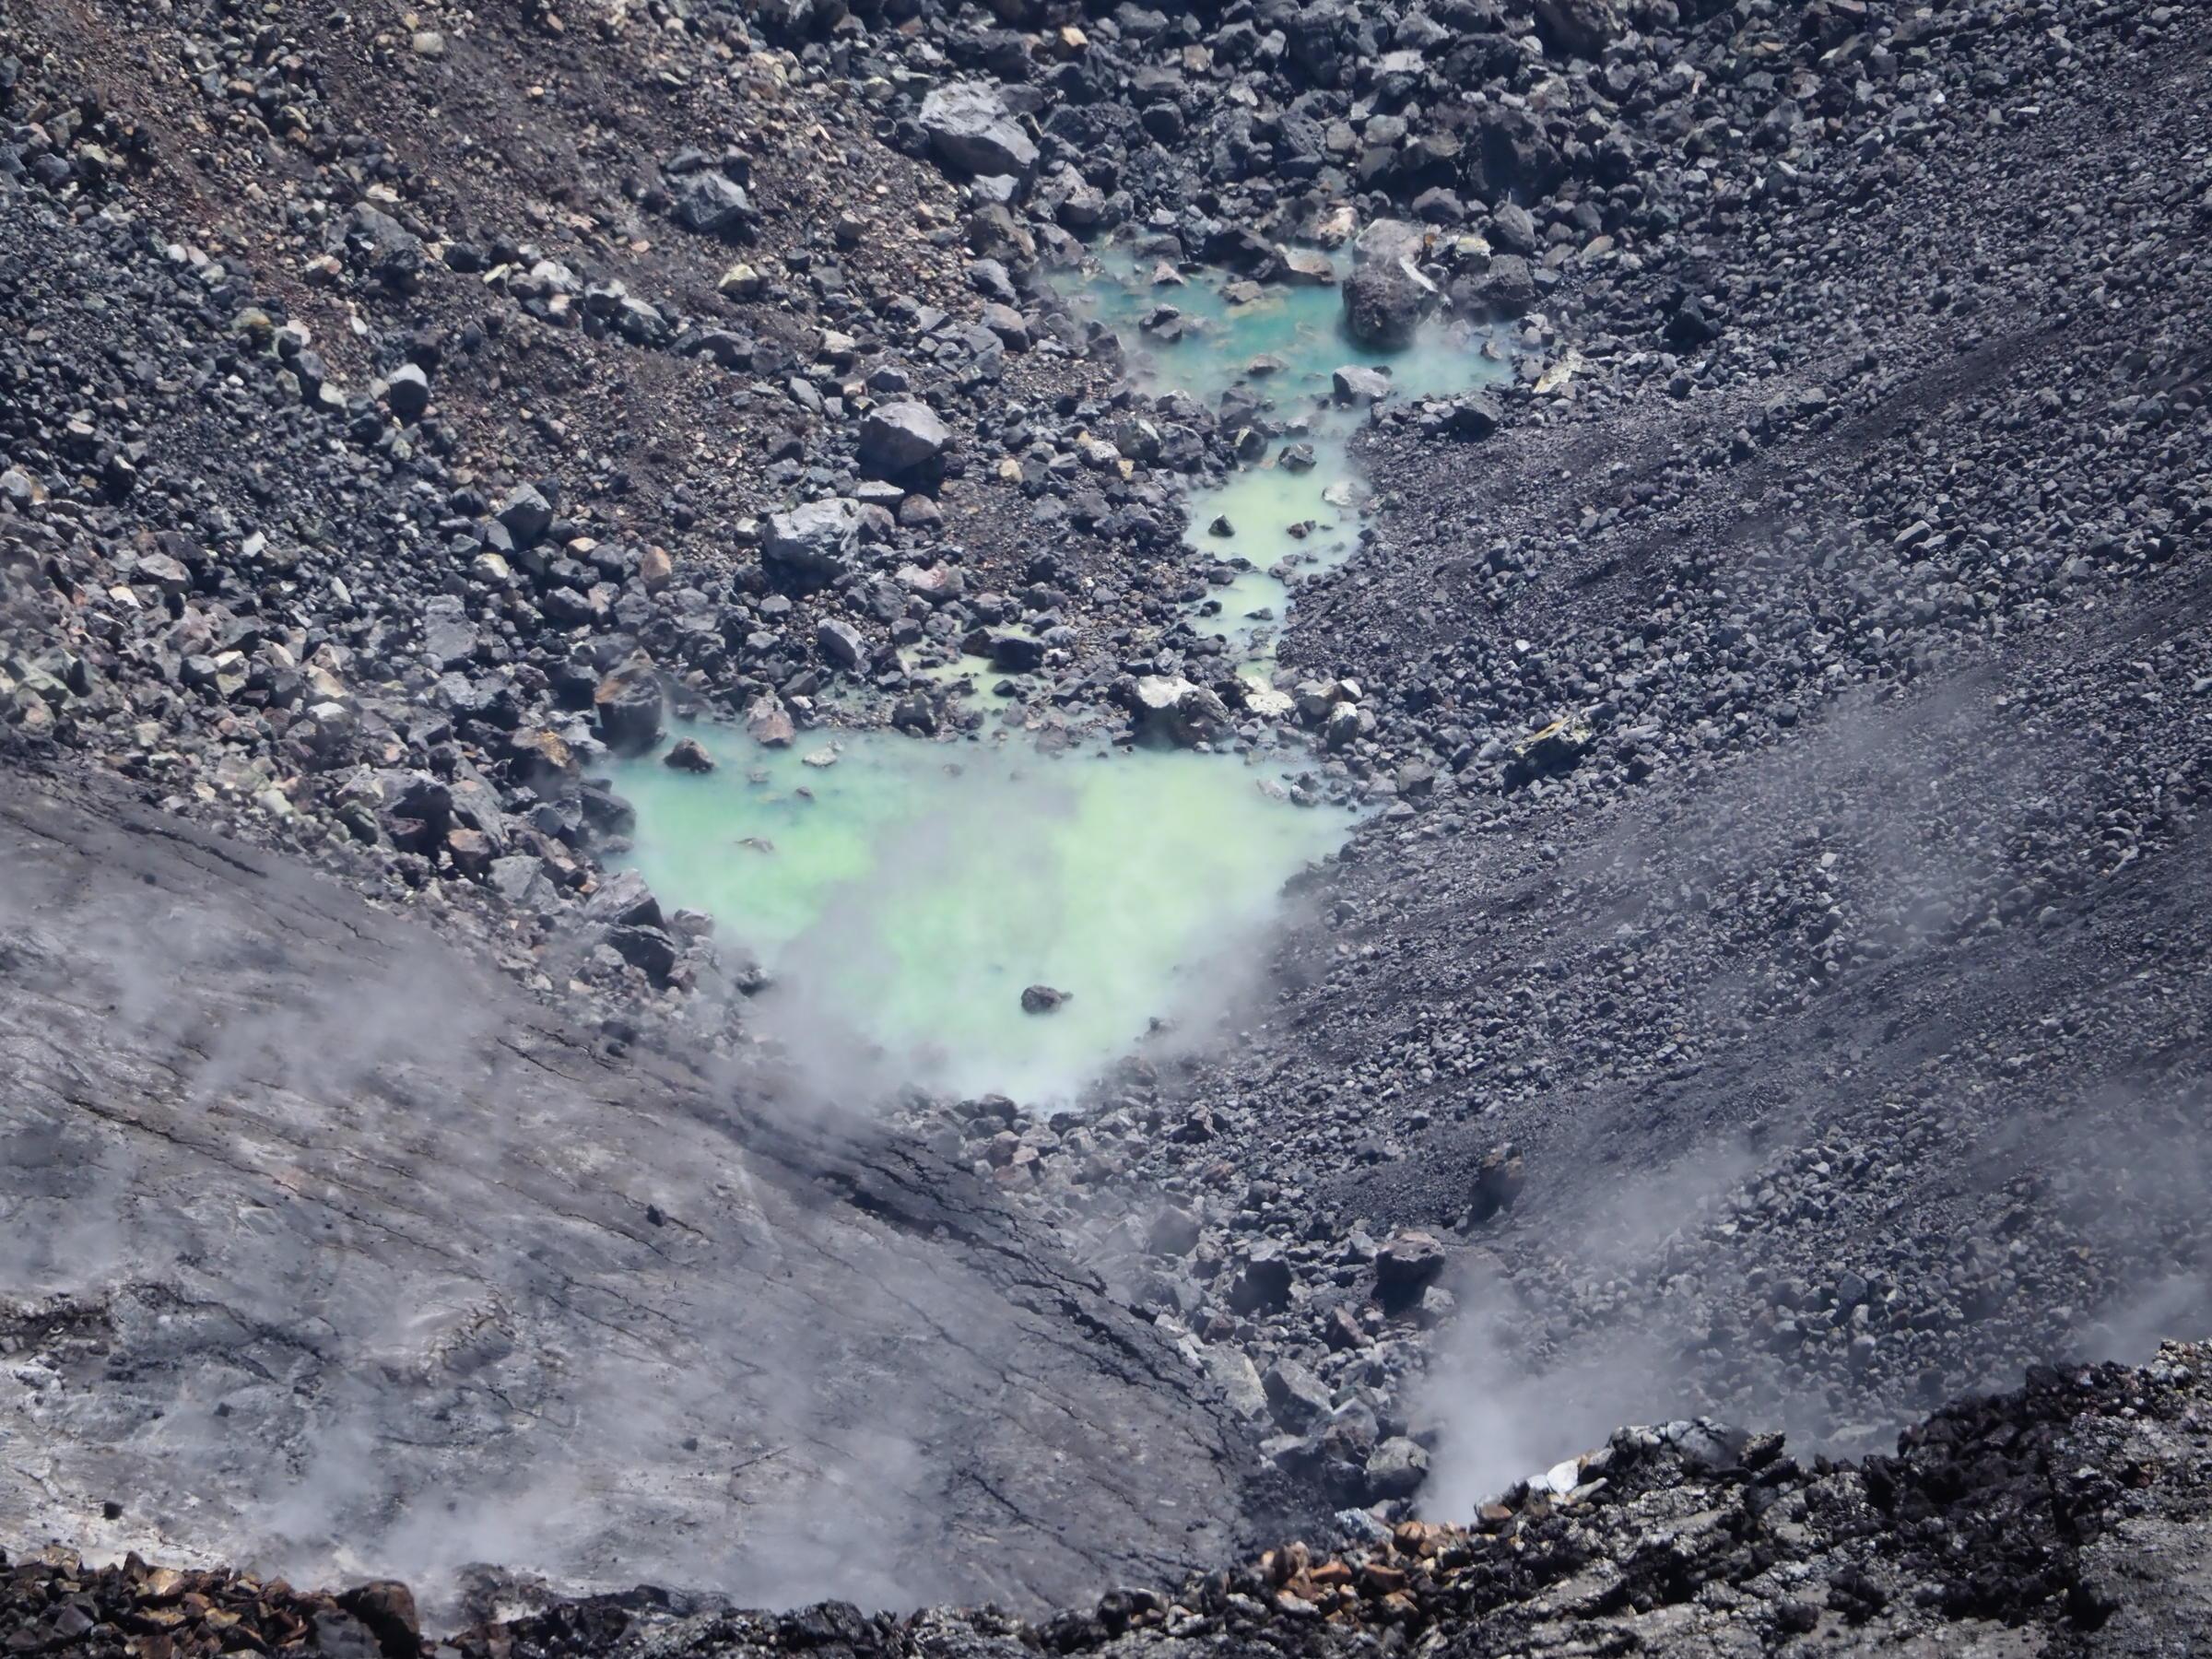 Inspecting Kilauea Infant Crater Lake